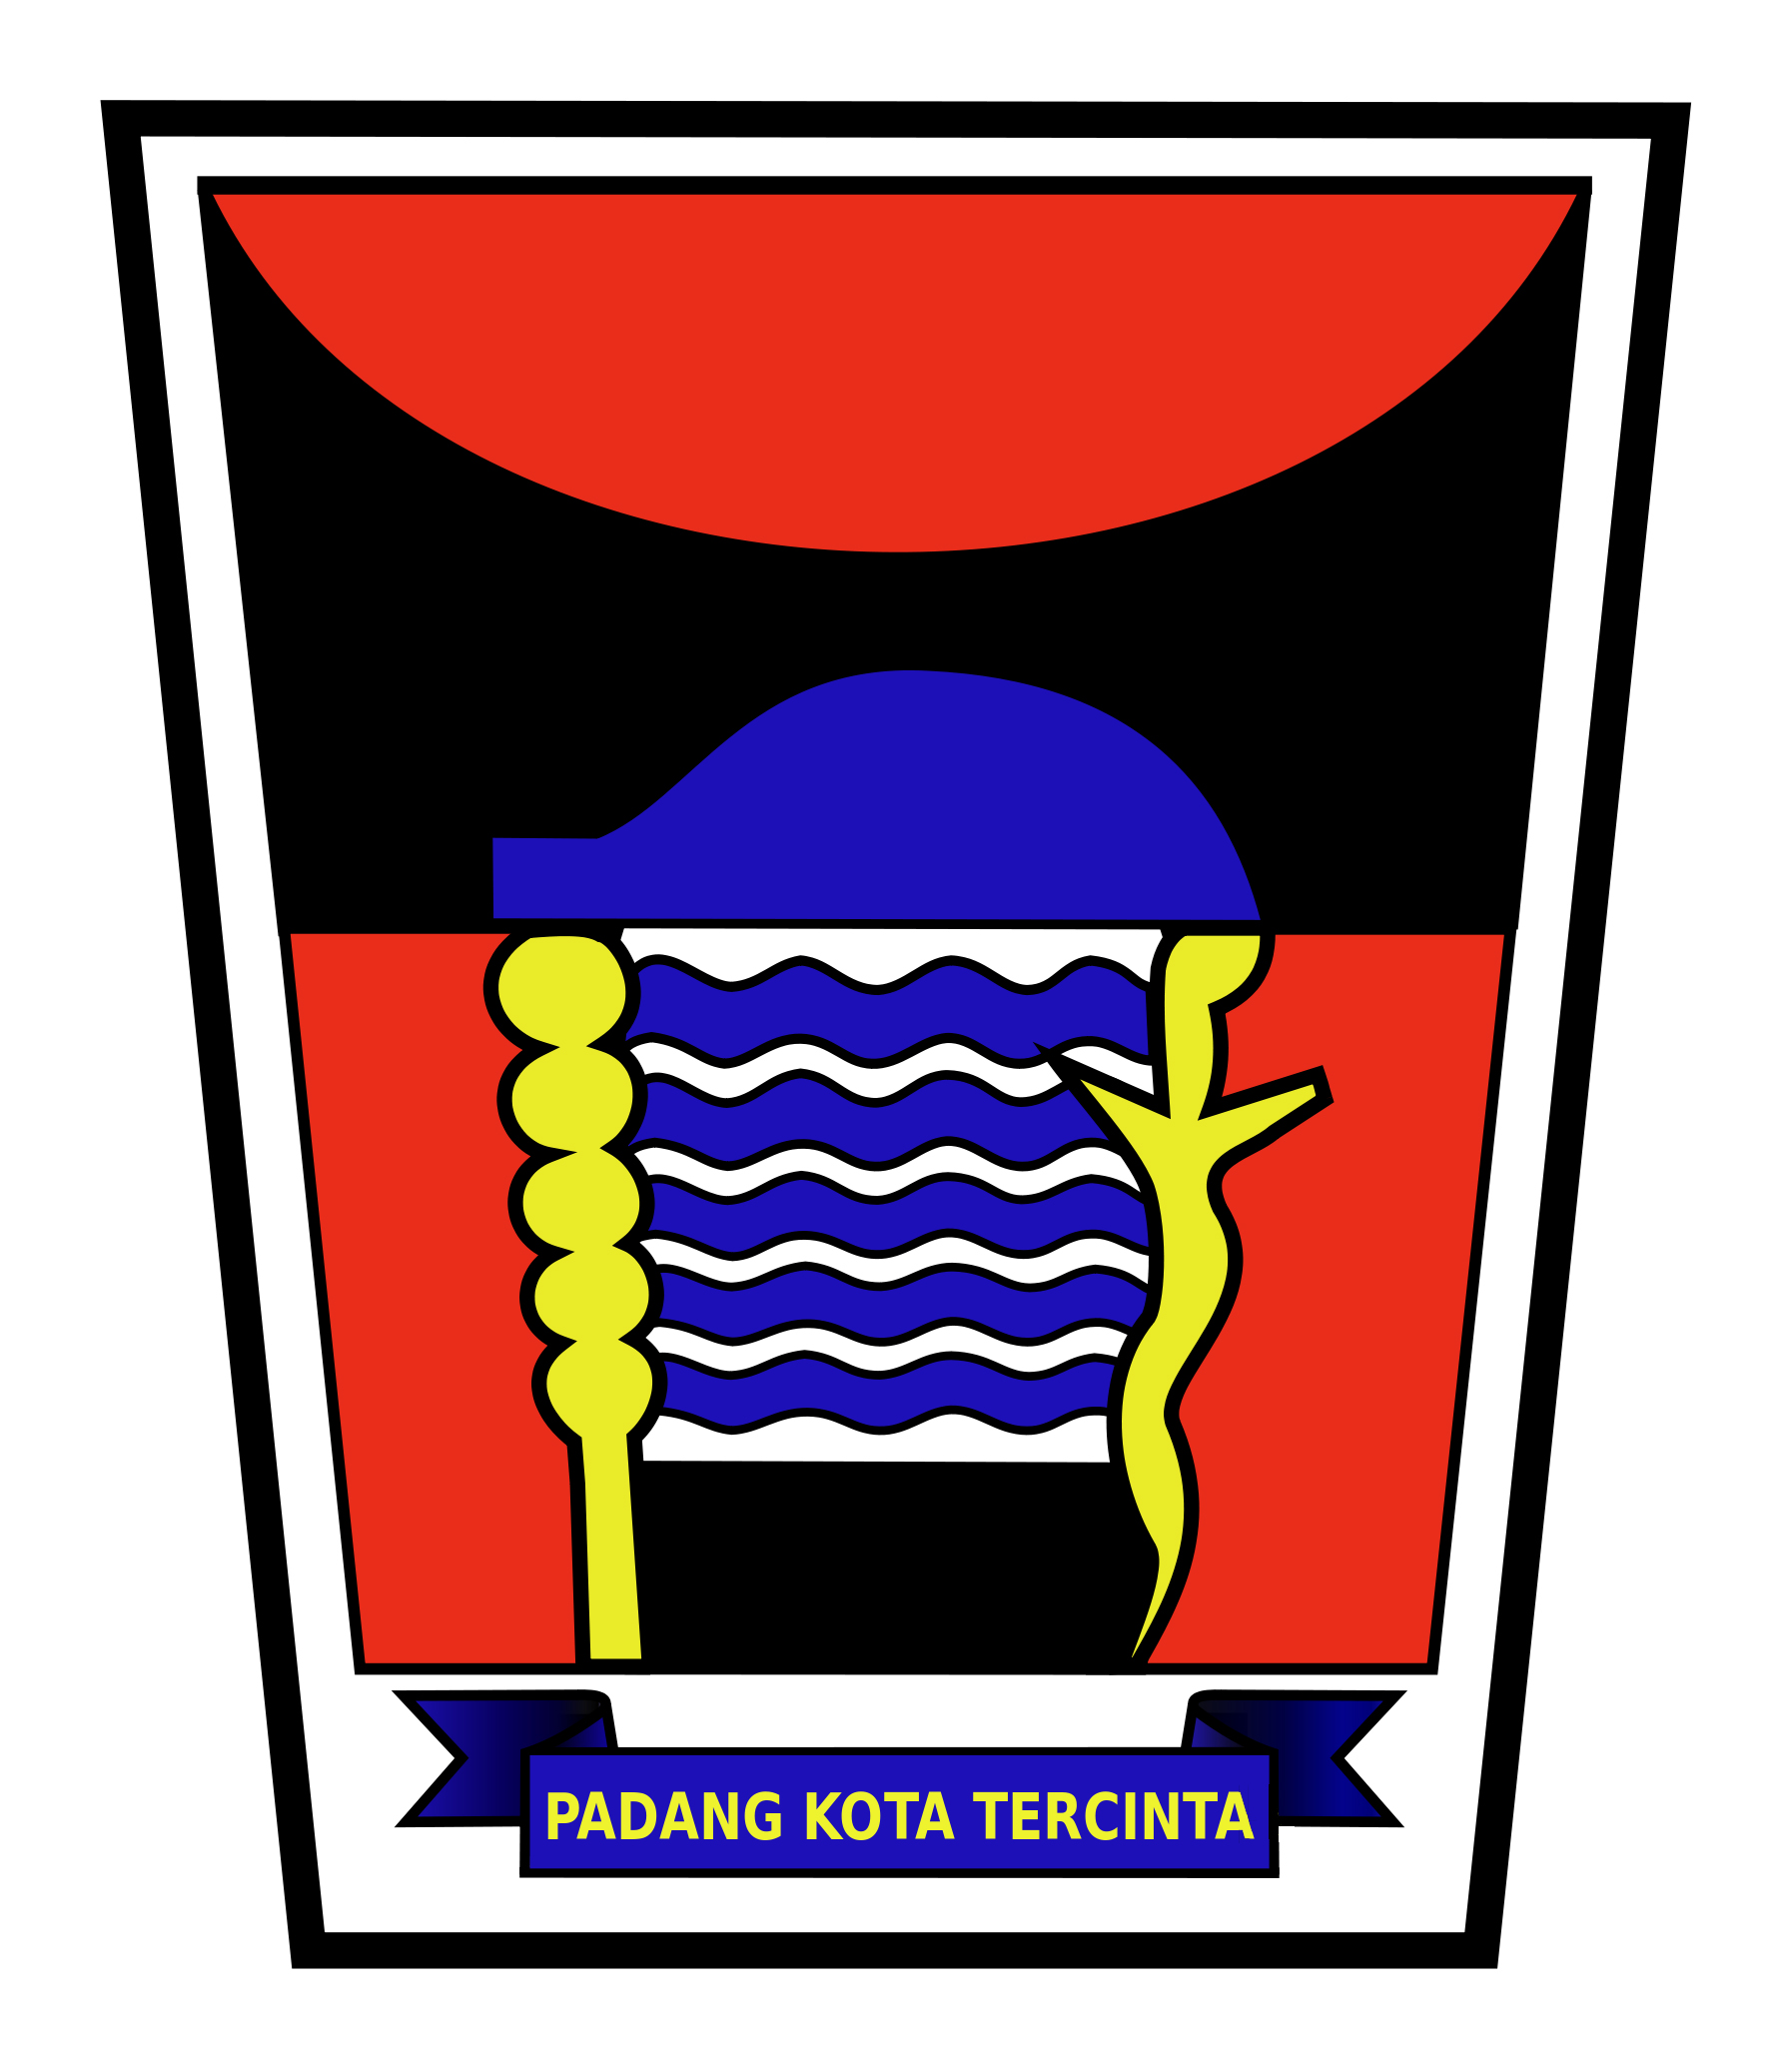 Logo Kota Padang (Provinsi Sumatera Barat) Original